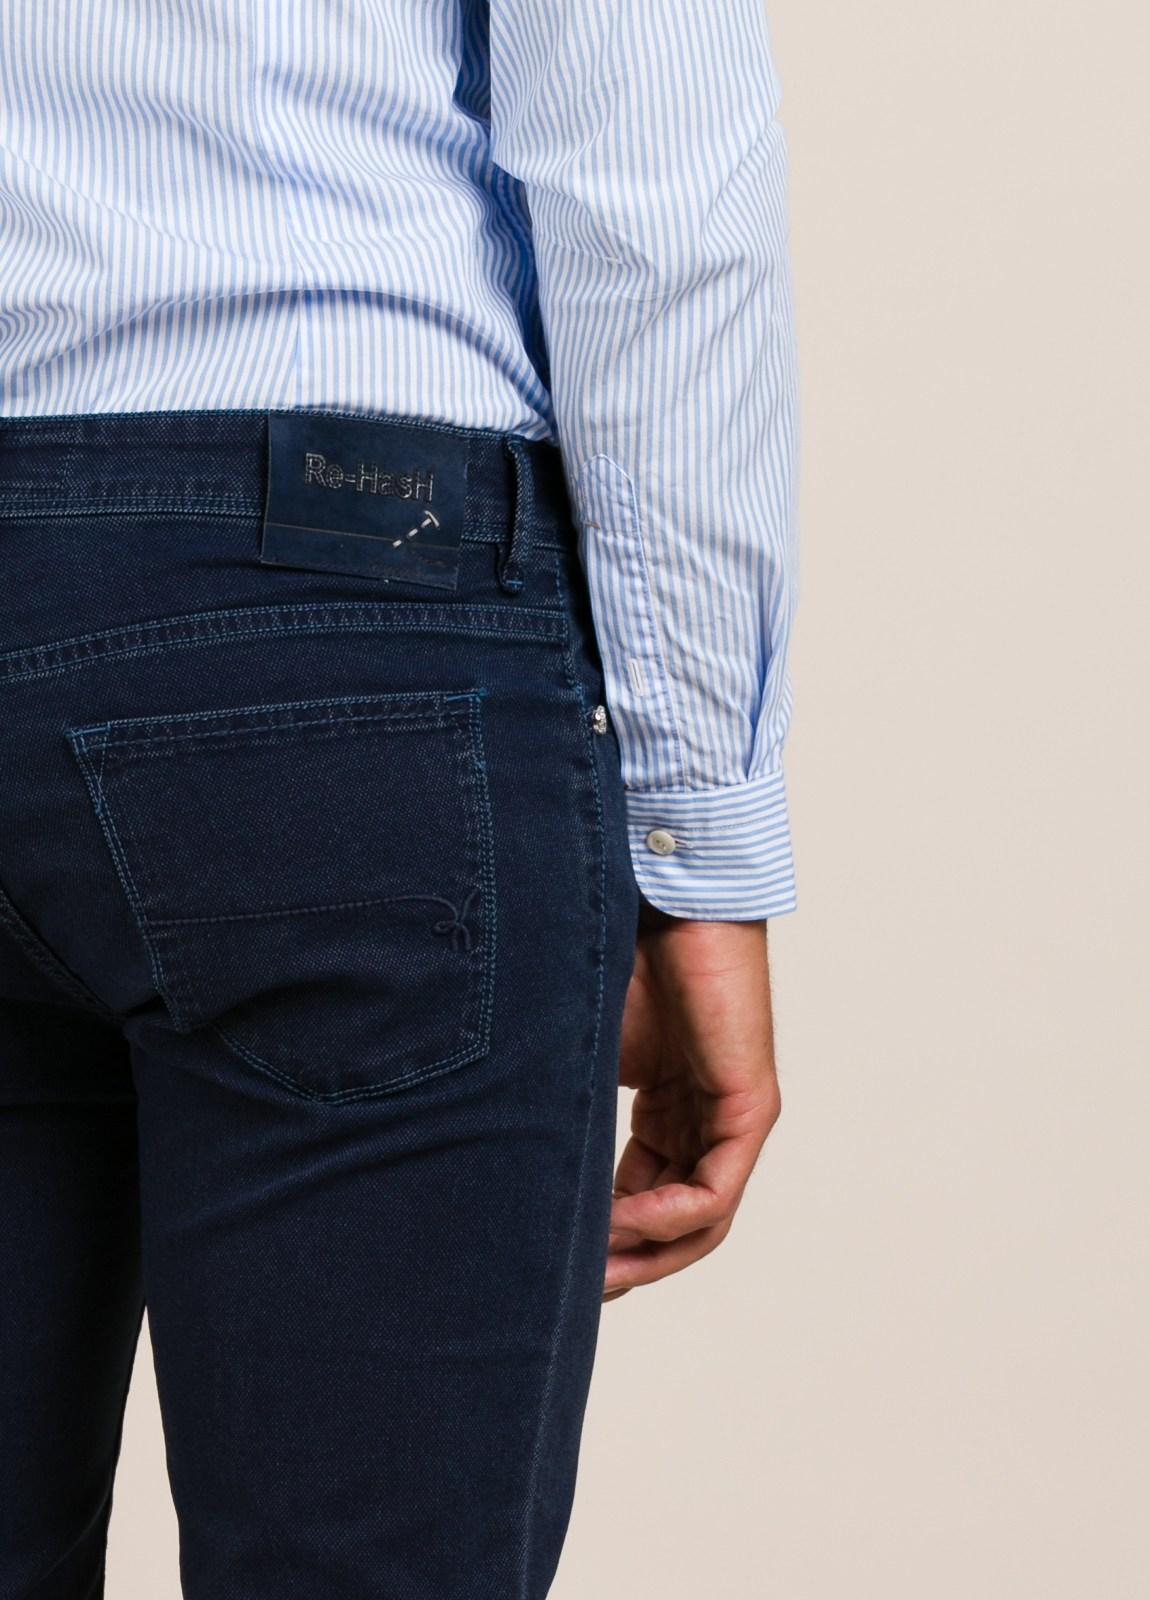 Pantalón sport RE-HASH slim fit marino - Ítem2